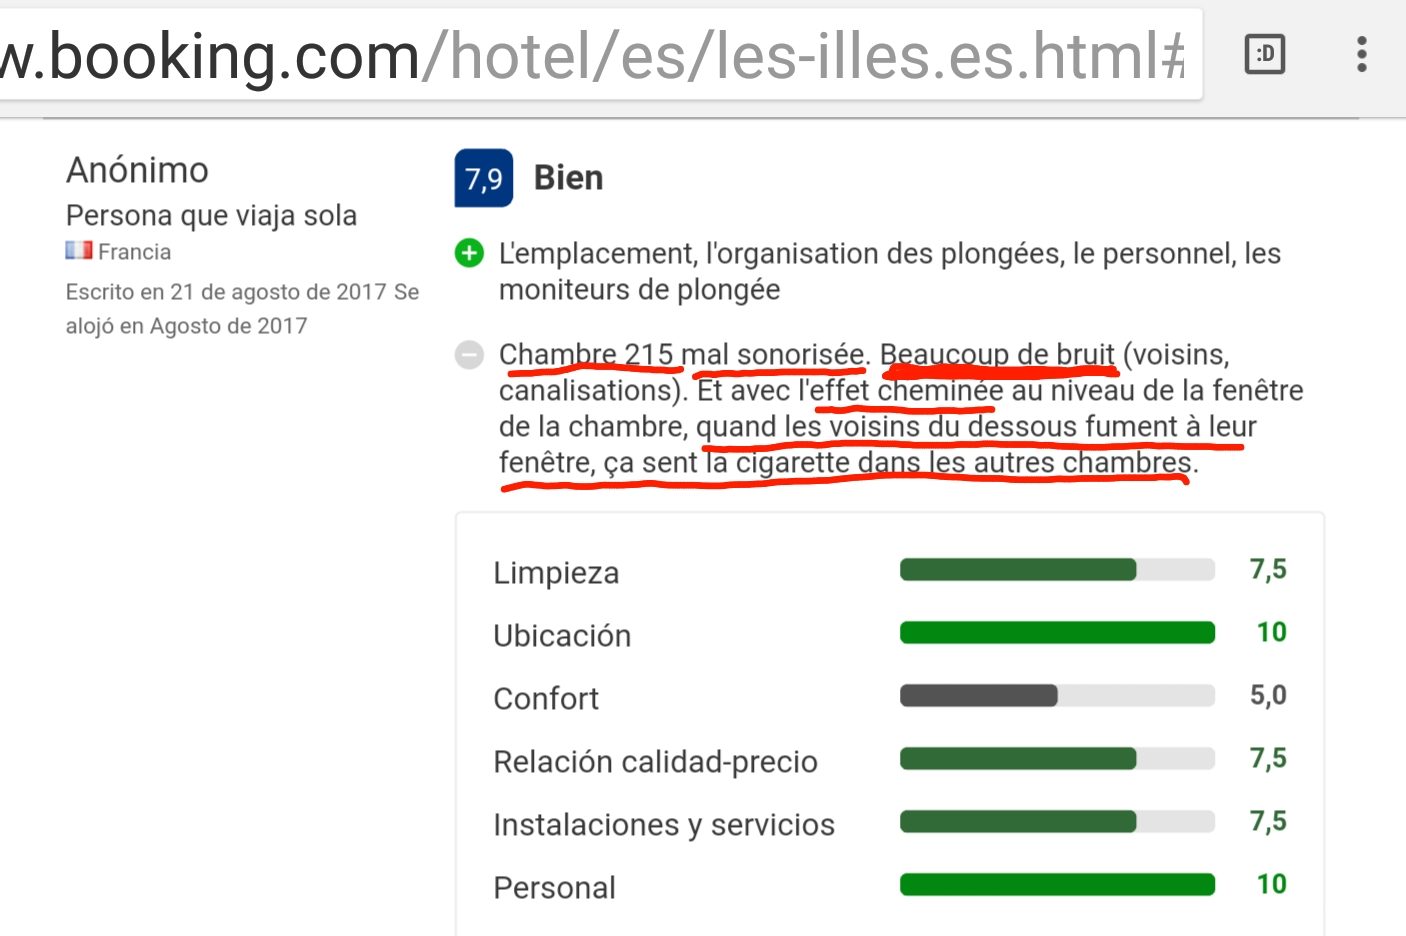 Les illes hotel estartit booking opinion